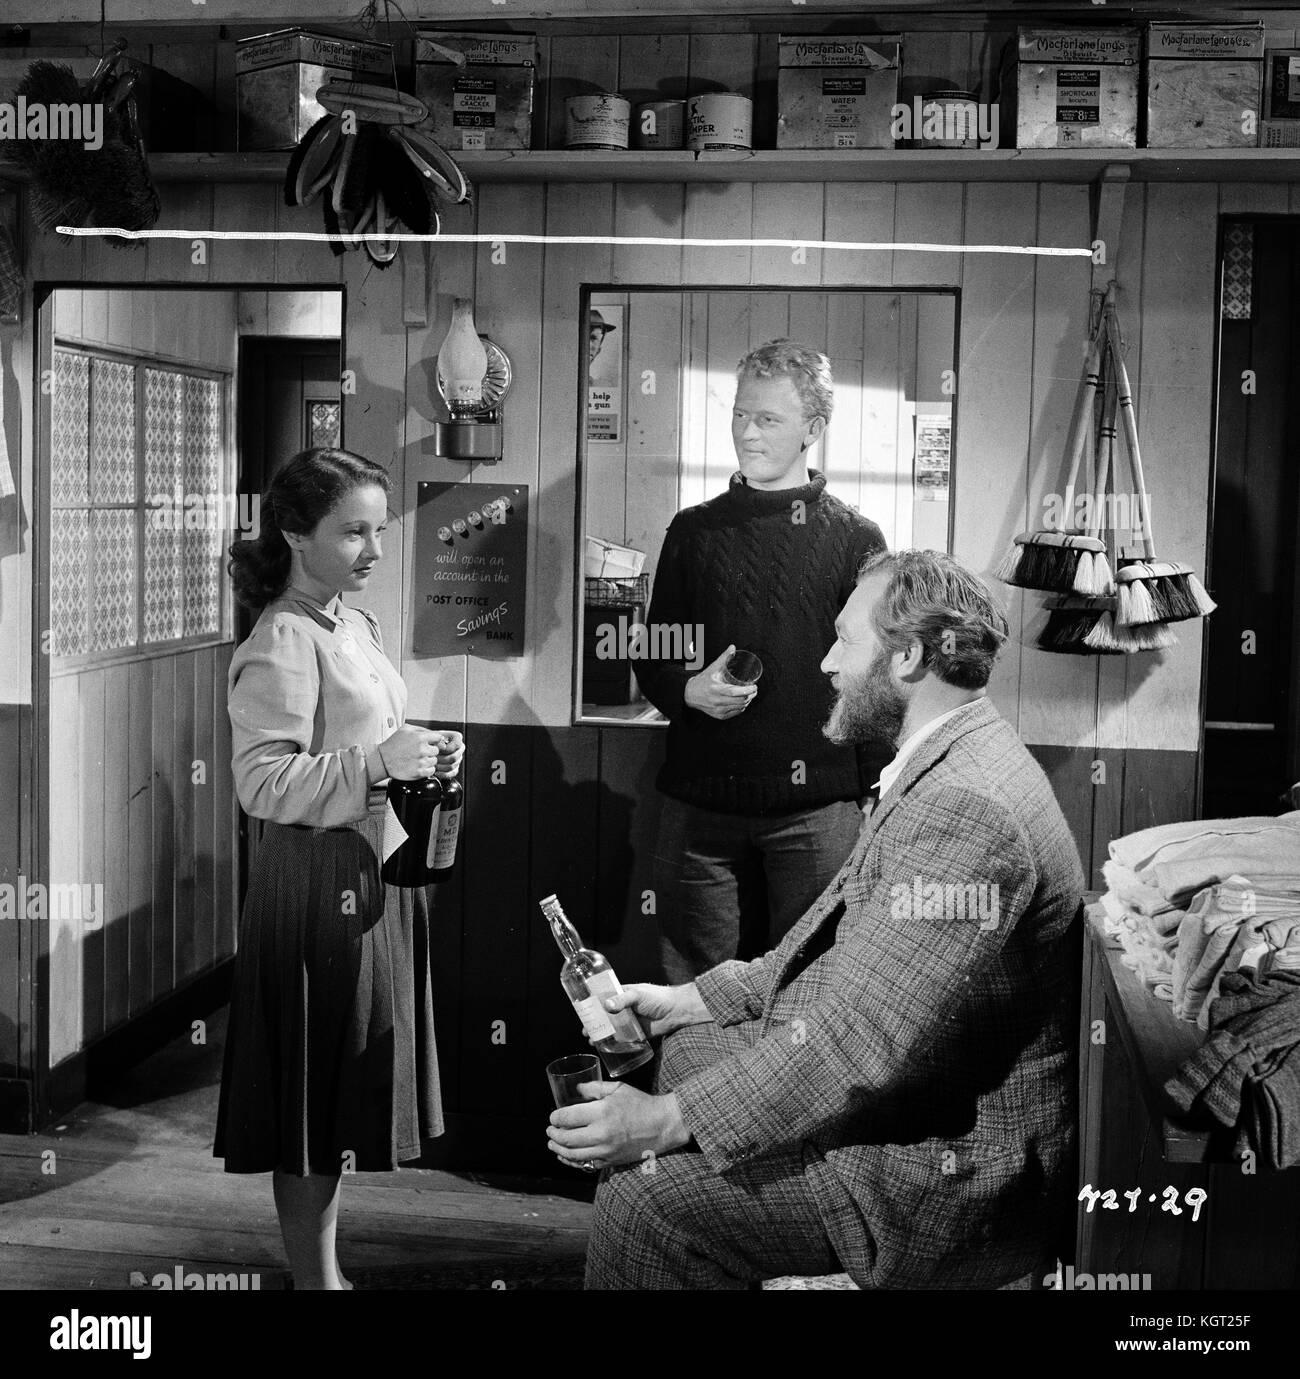 Whisky Galore (1949), Gordon Jackson, Gabrielle Blunt, James Robertson Justice - Stock Image